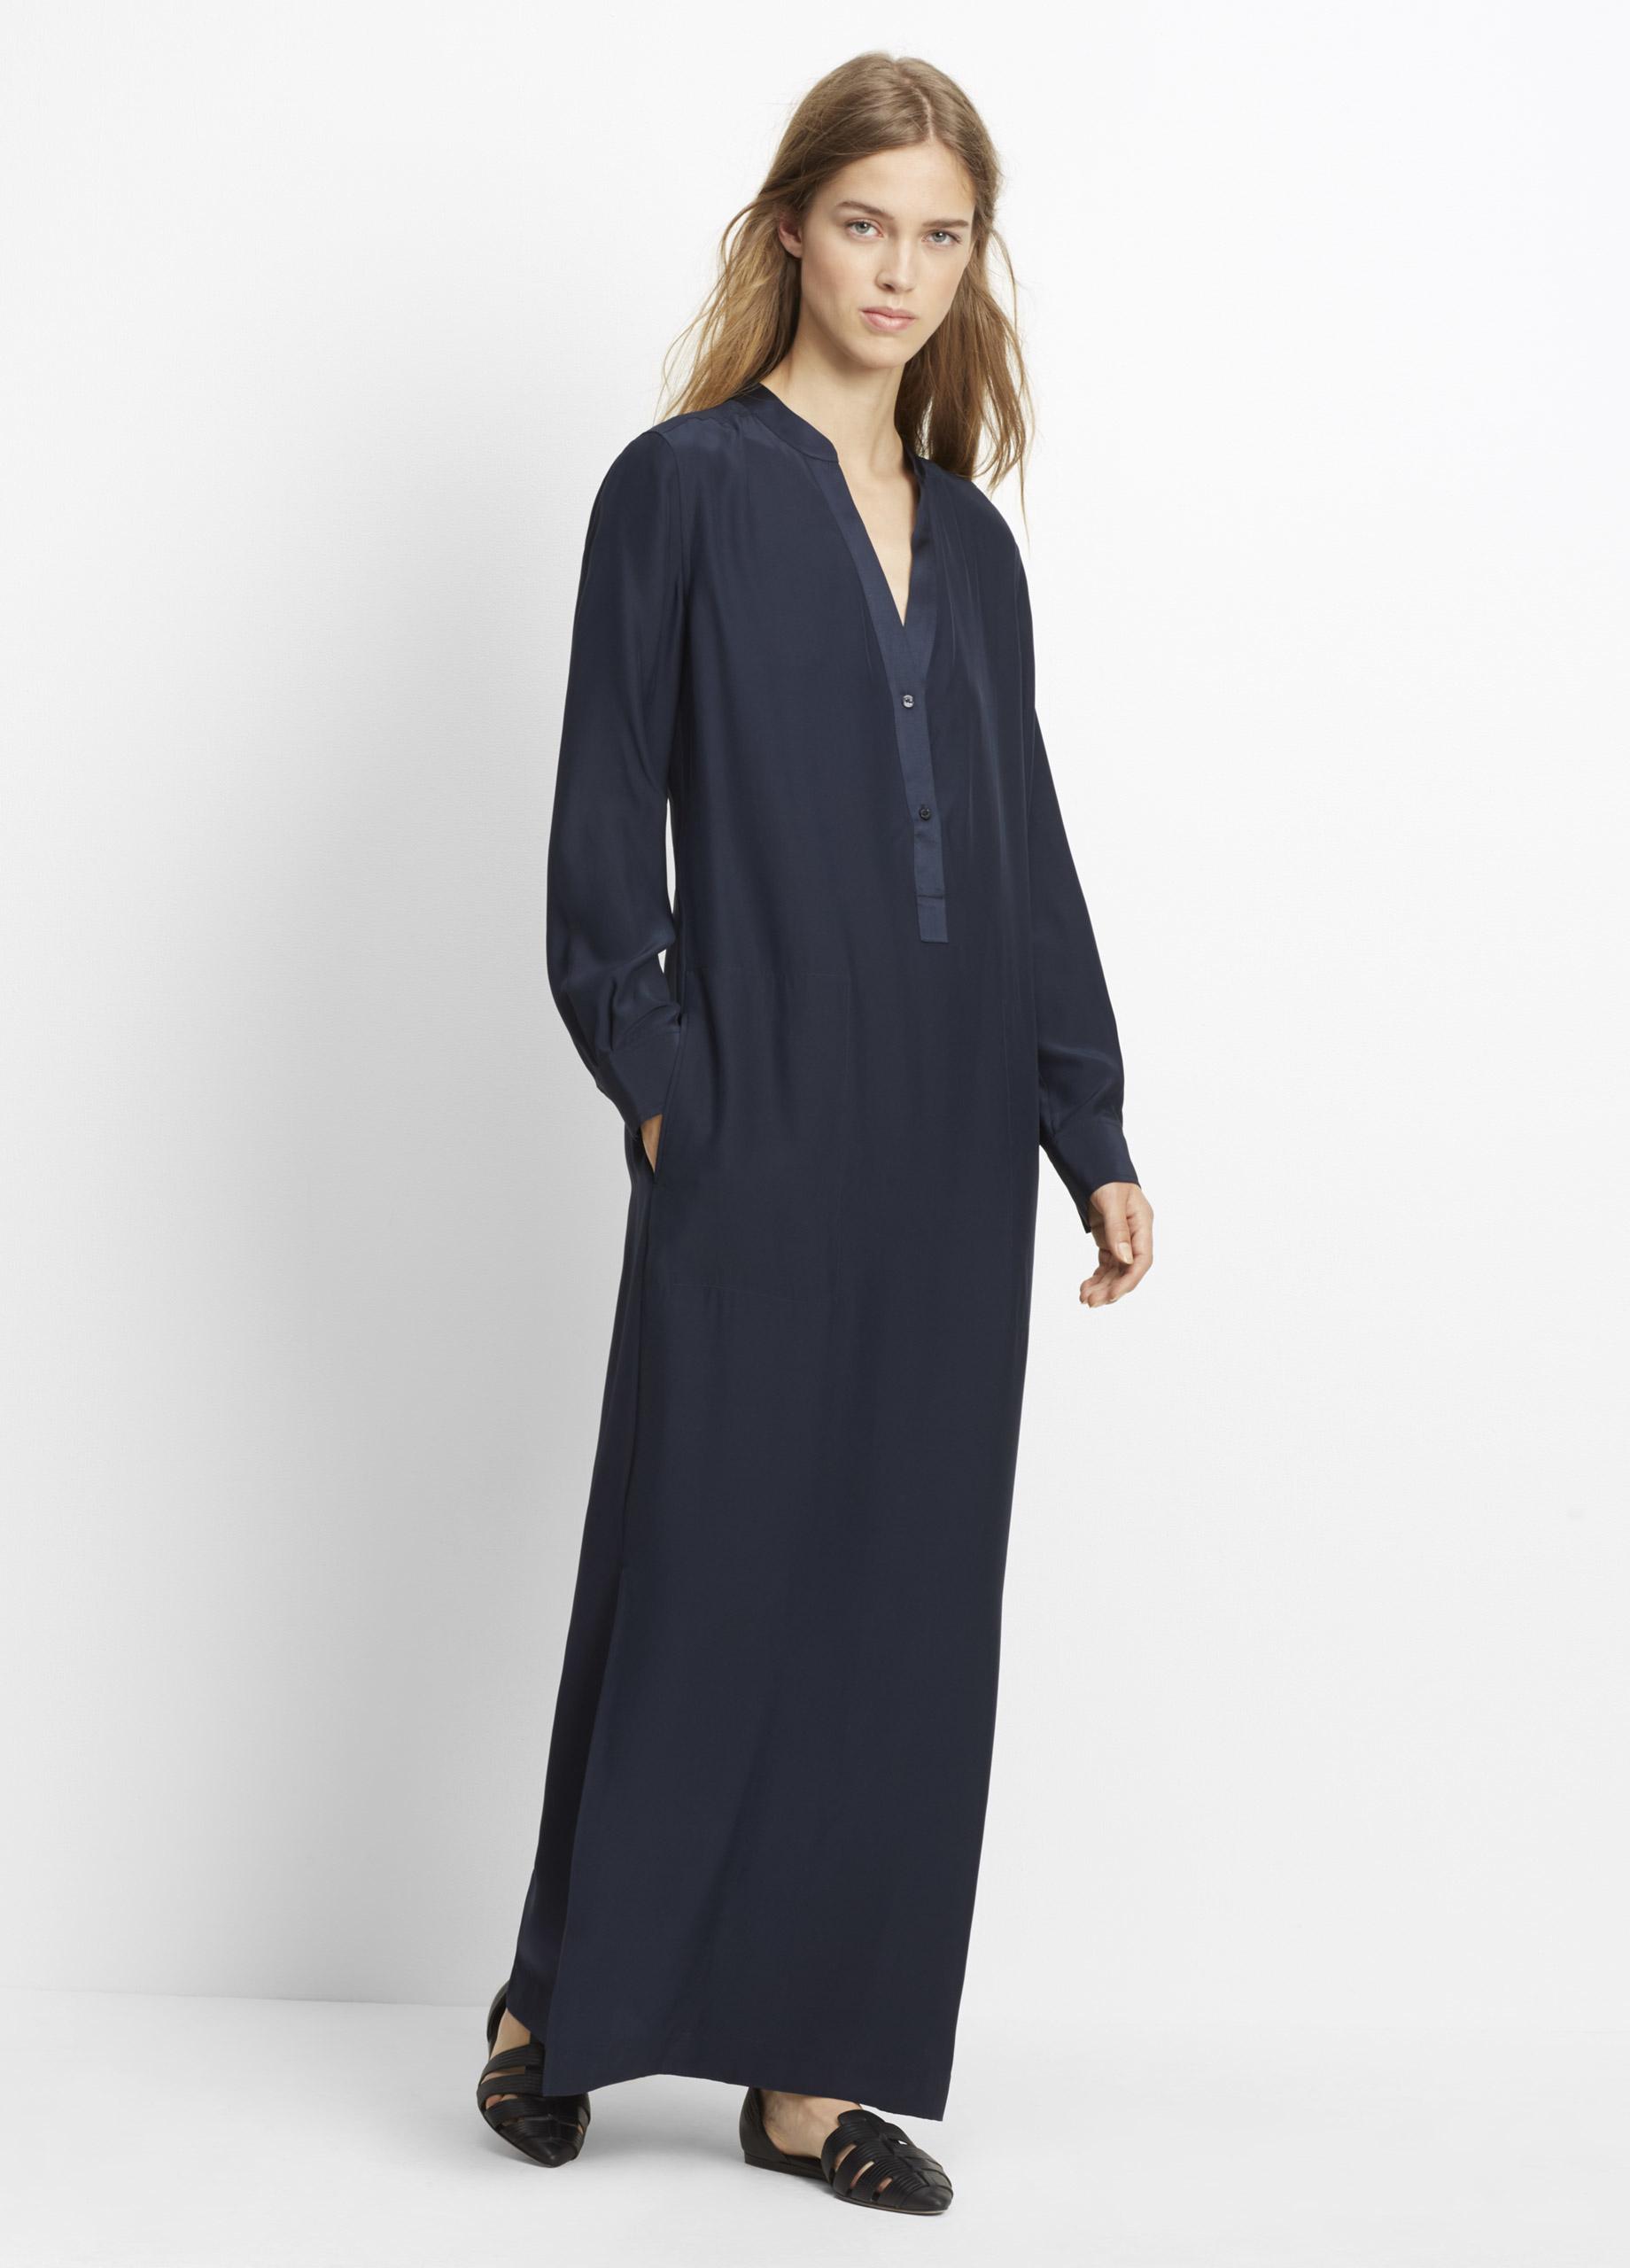 Tory Burch Rosemary Empire Waist Long Sleeve Silk Floral Maxi Dress. Tory Burch